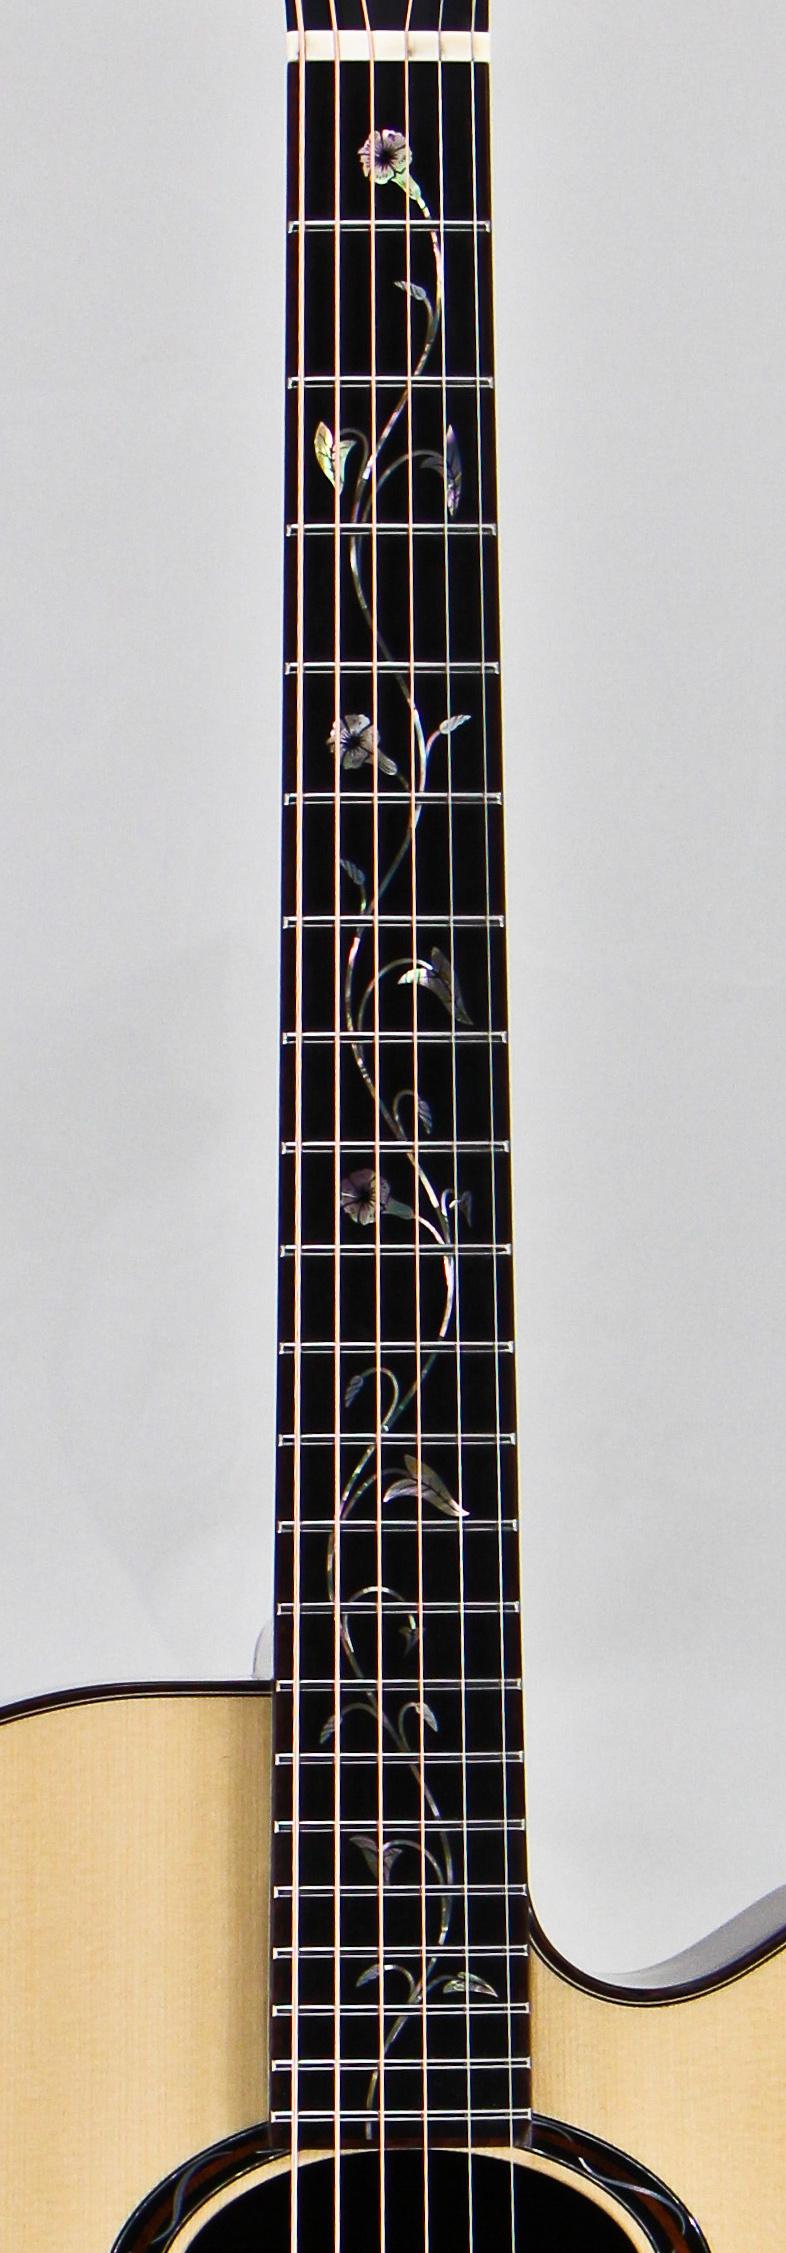 vinerhap-4.JPG